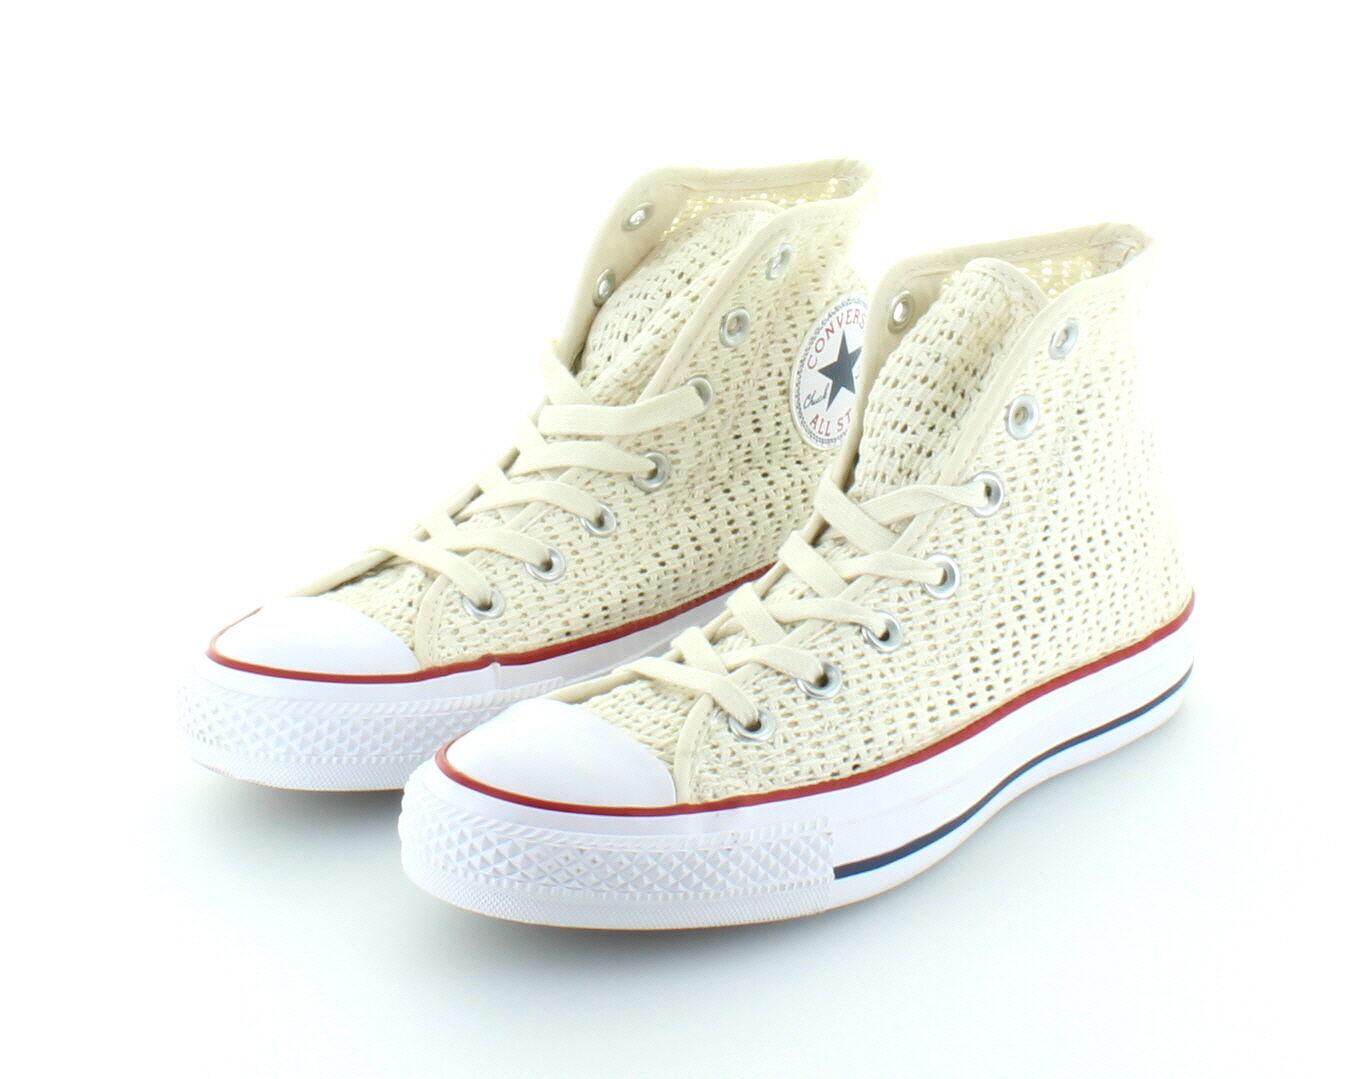 Converse All Star Star Star Chuck Taylor Hi Cotton Parchment talla 37,5 38,5  entrega gratis